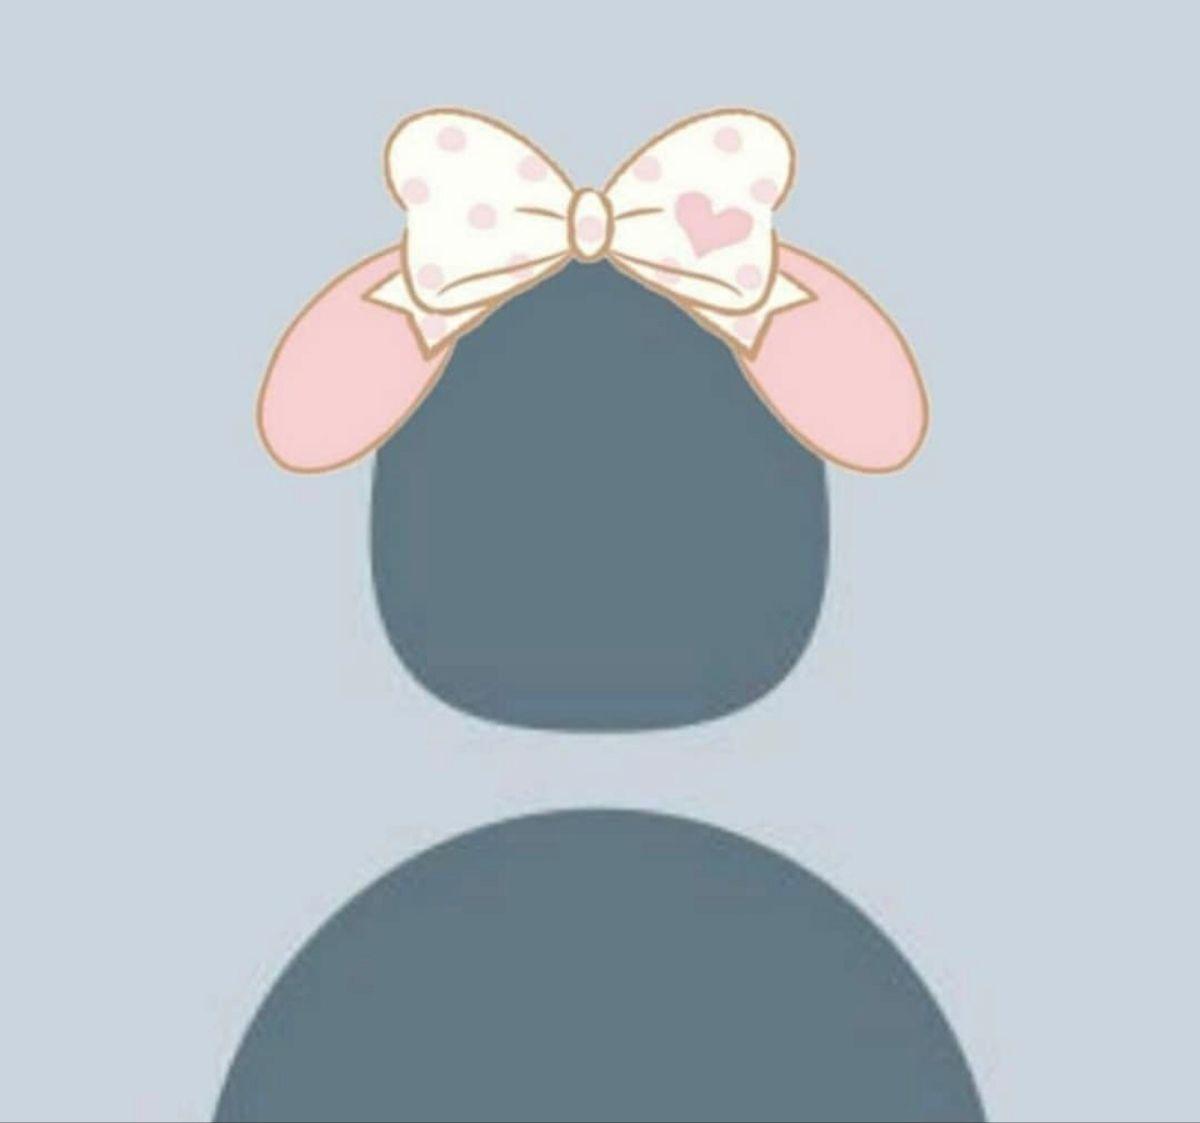 Pin by marjan on ʚ pfps ɞ in 2020   Cute profile pictures ...